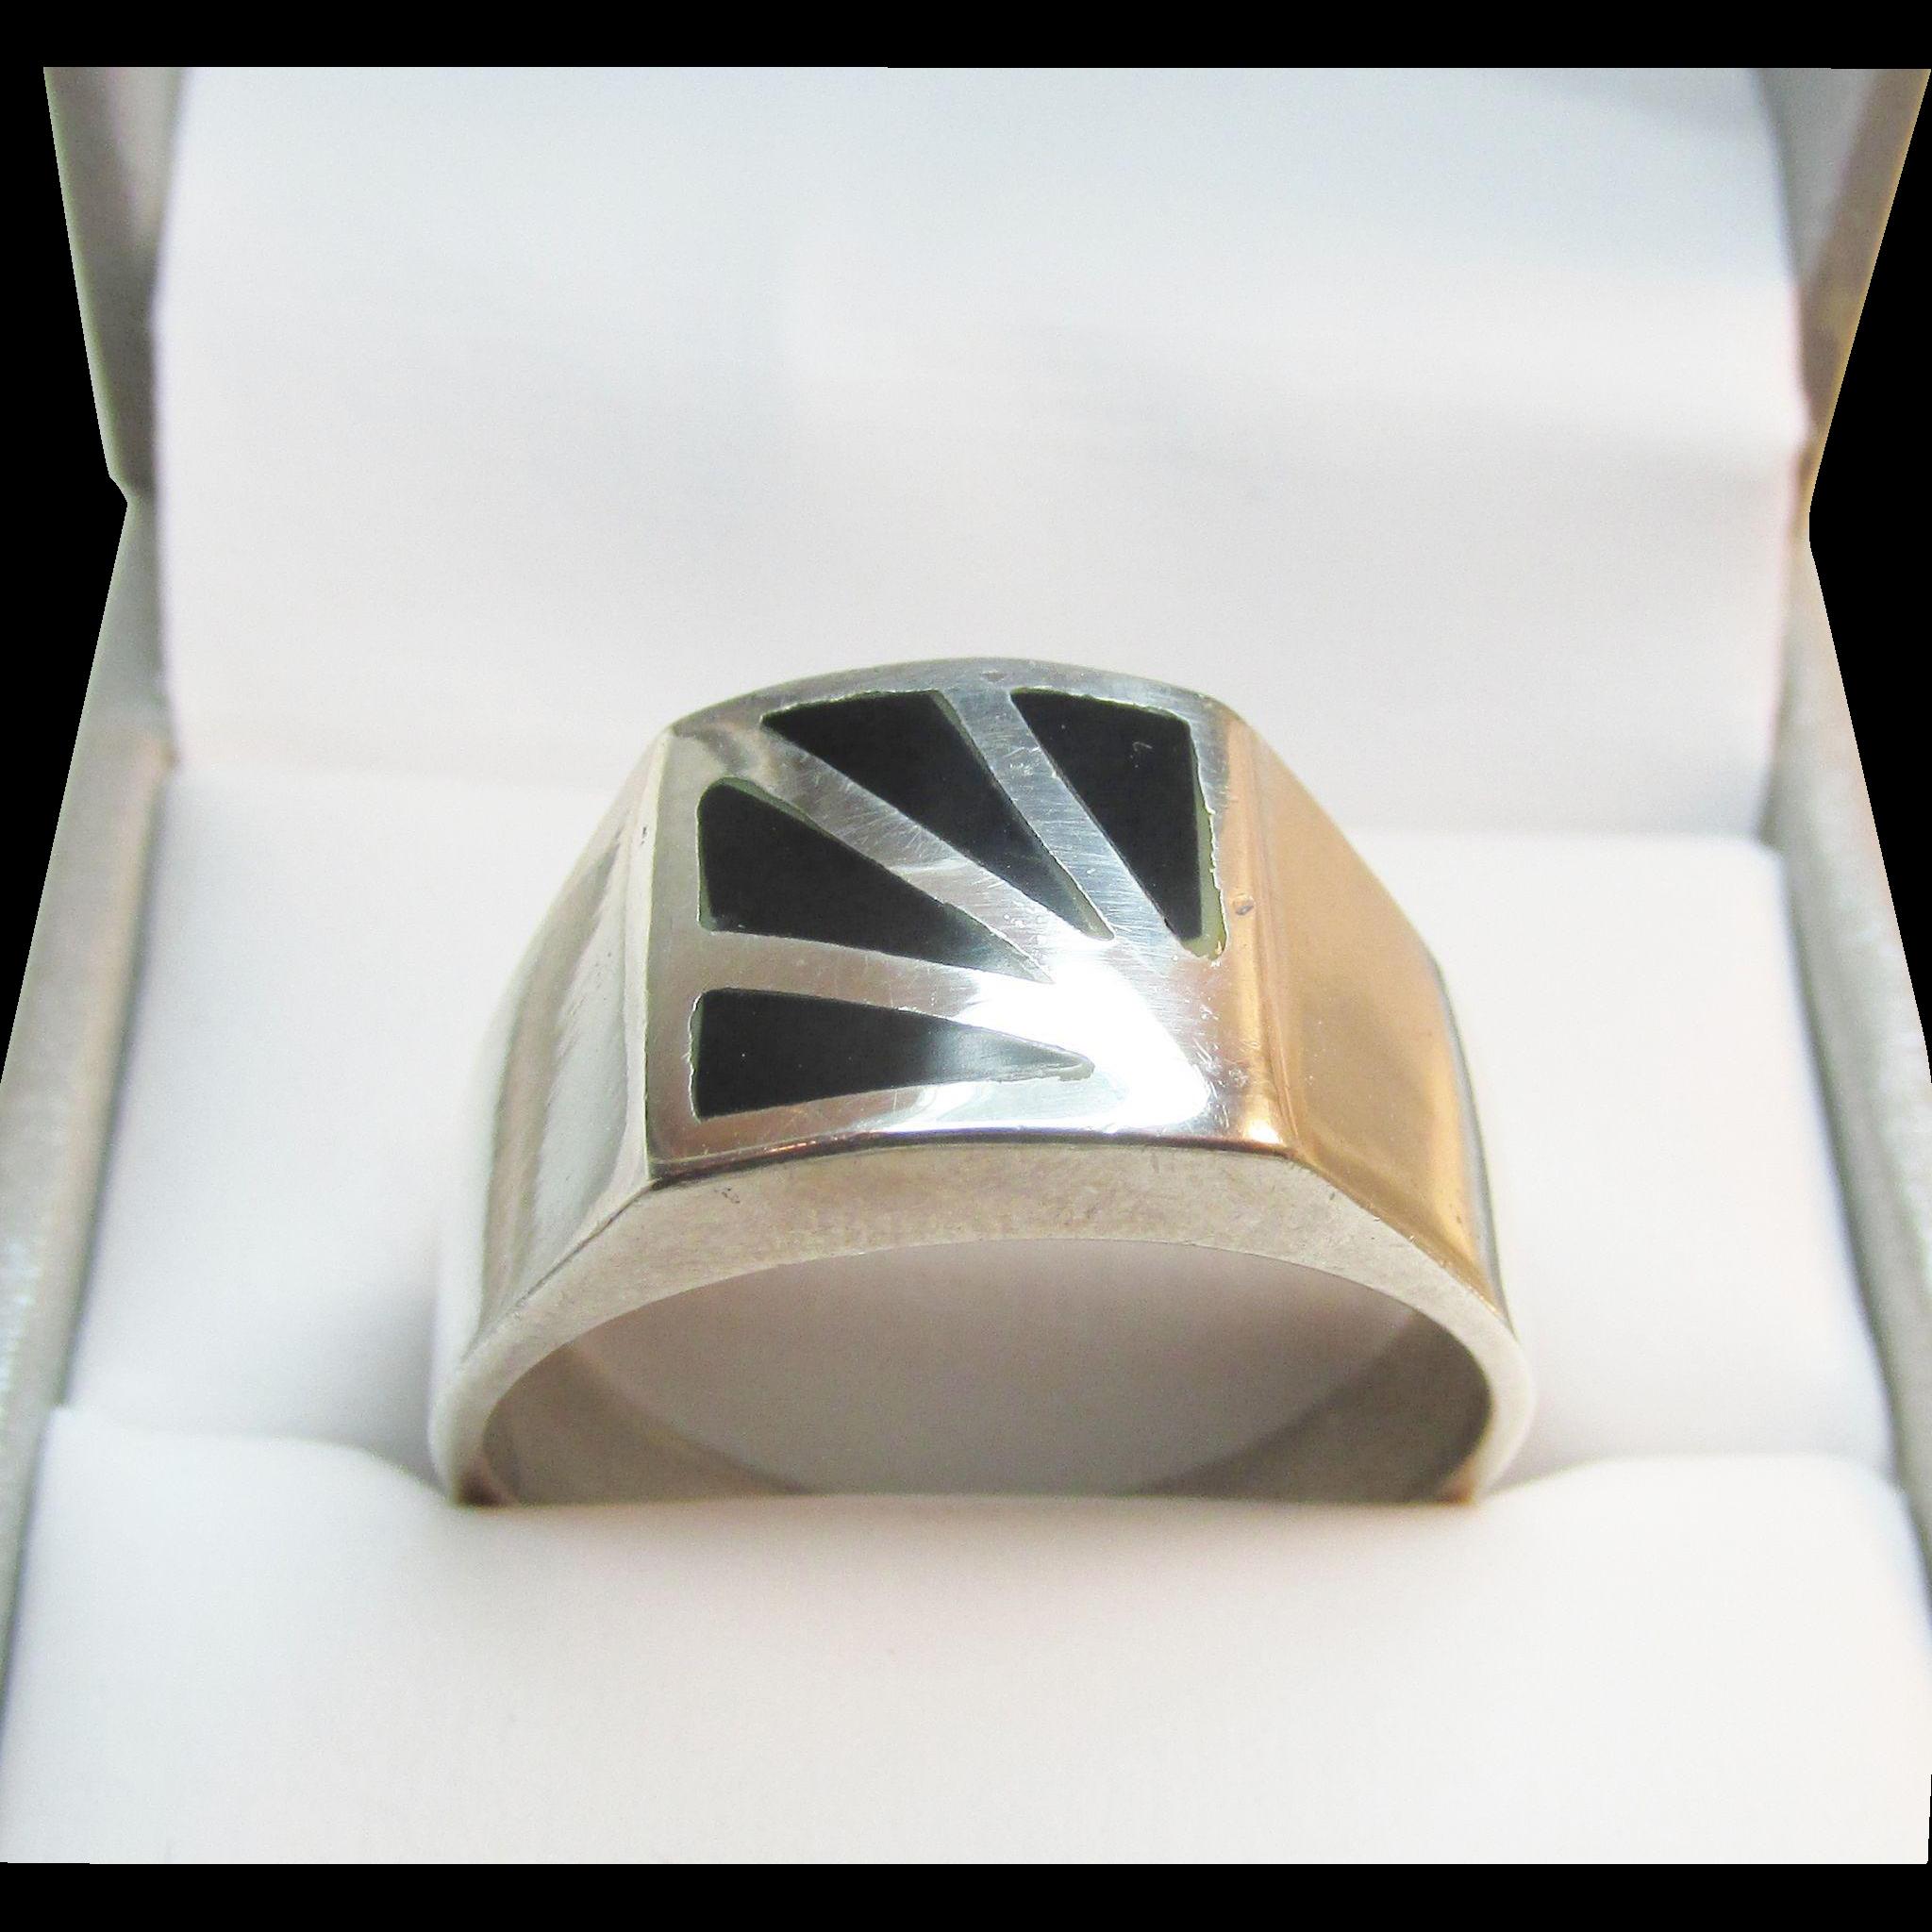 Large Sterling Onyx Inlaid Sunburst Ring Sleek Vintage 8.95 Grams